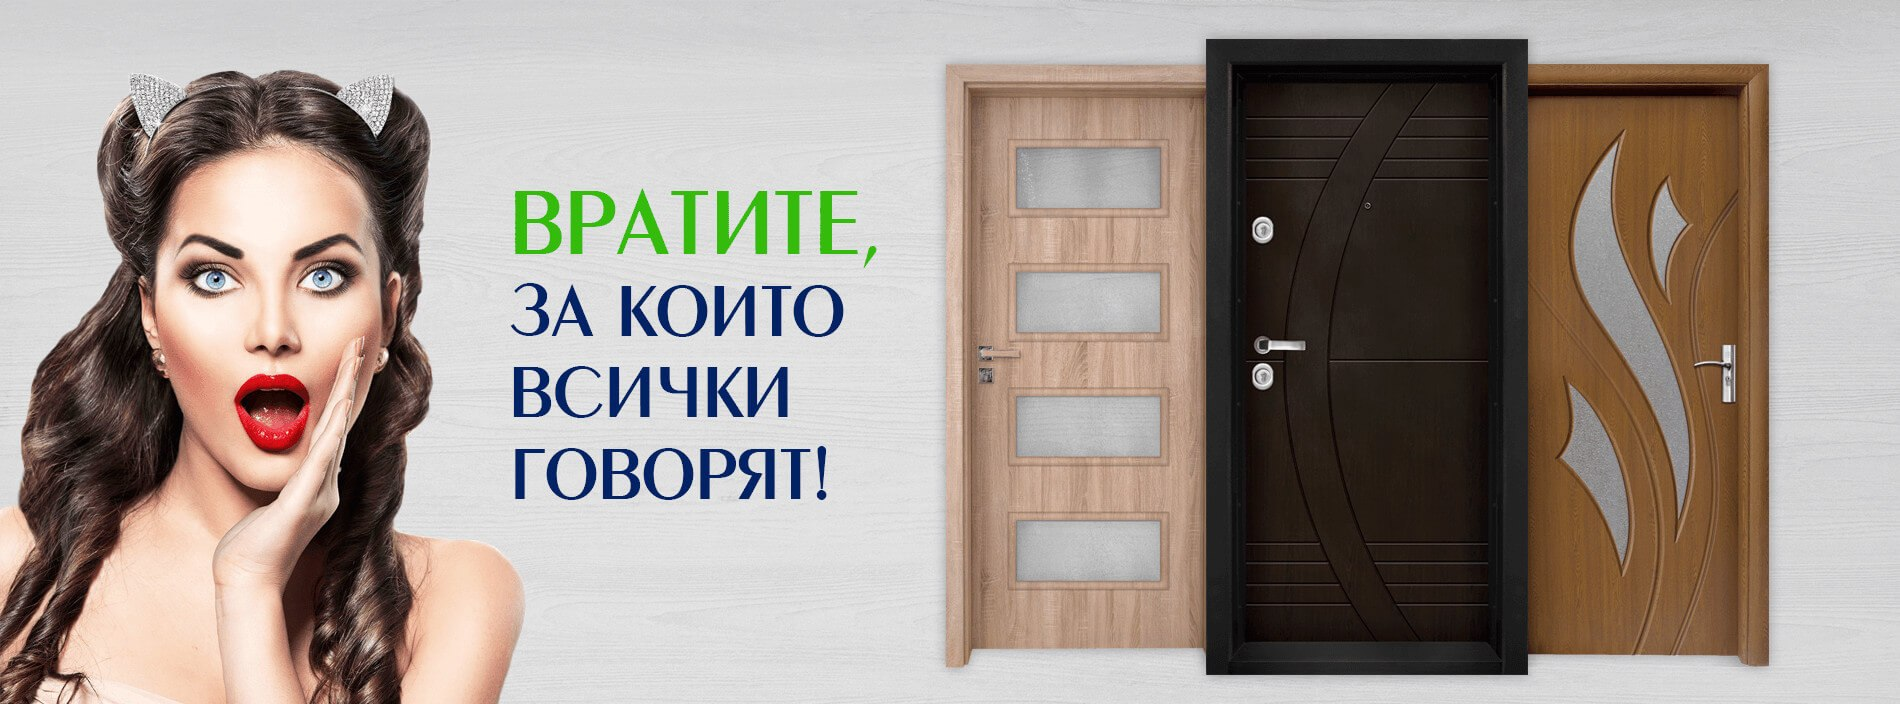 Врати Порта Нова София